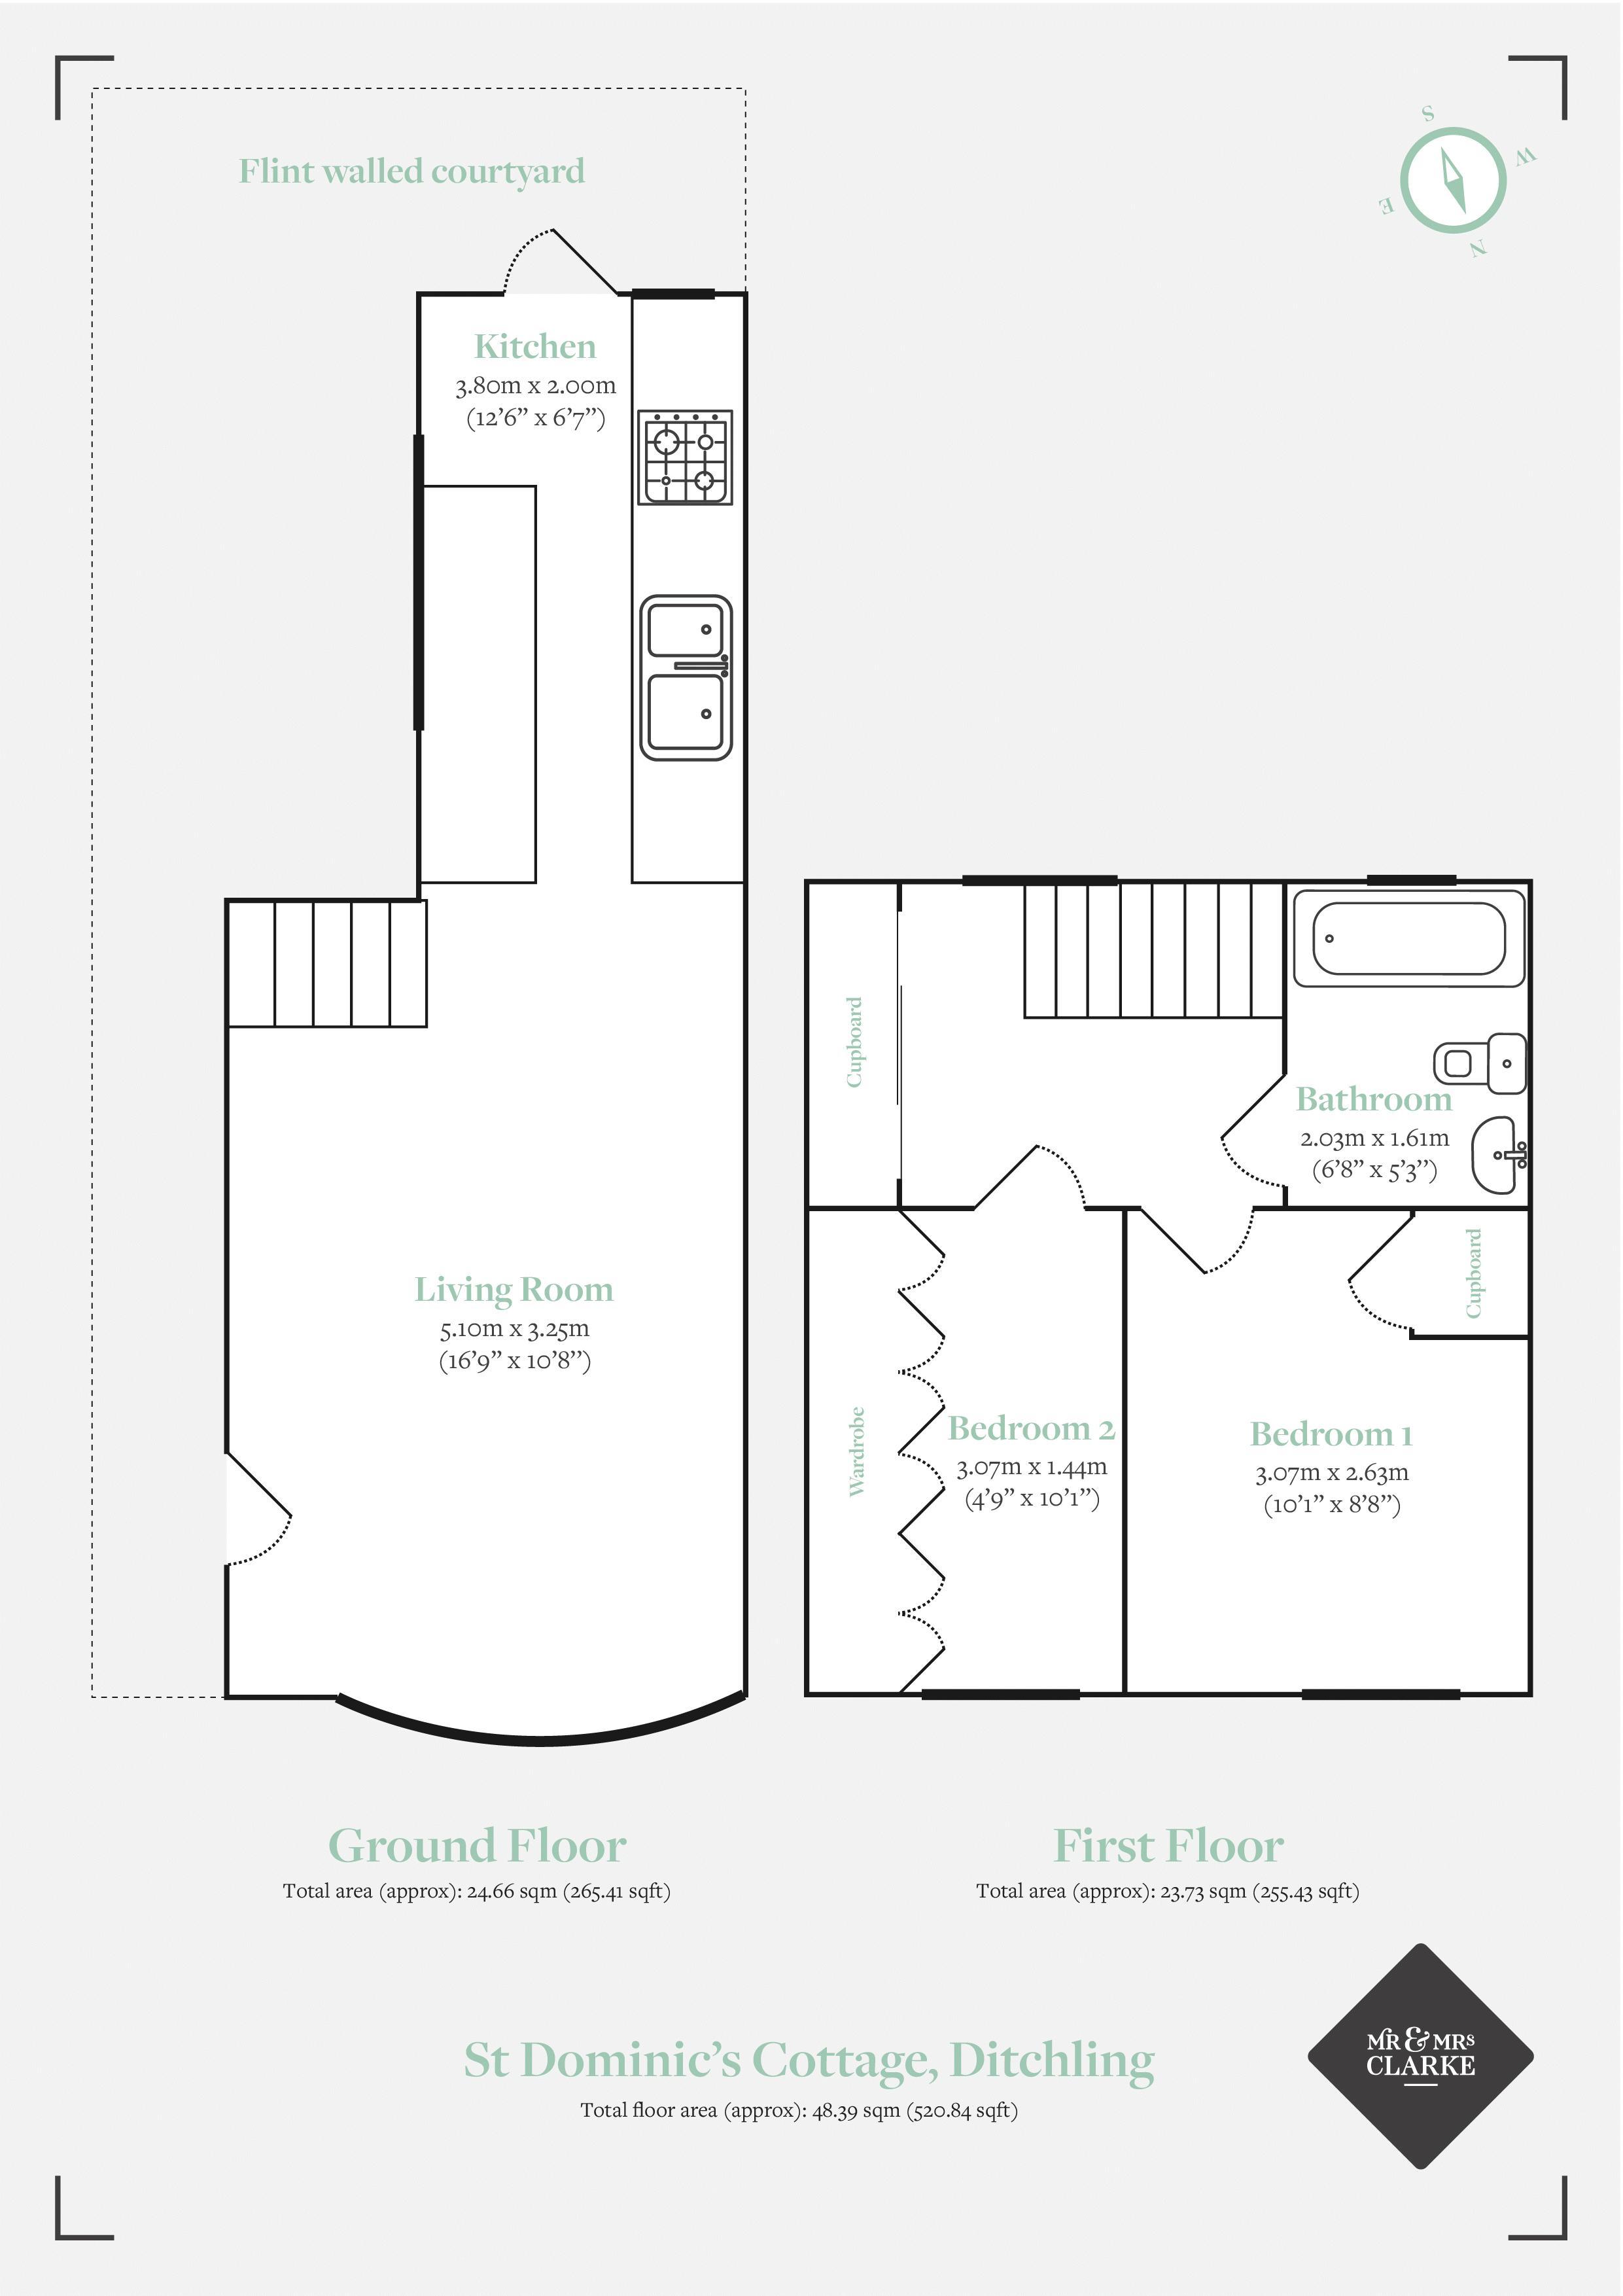 St Dominic's Cottage, Ditchling. Floorplan.